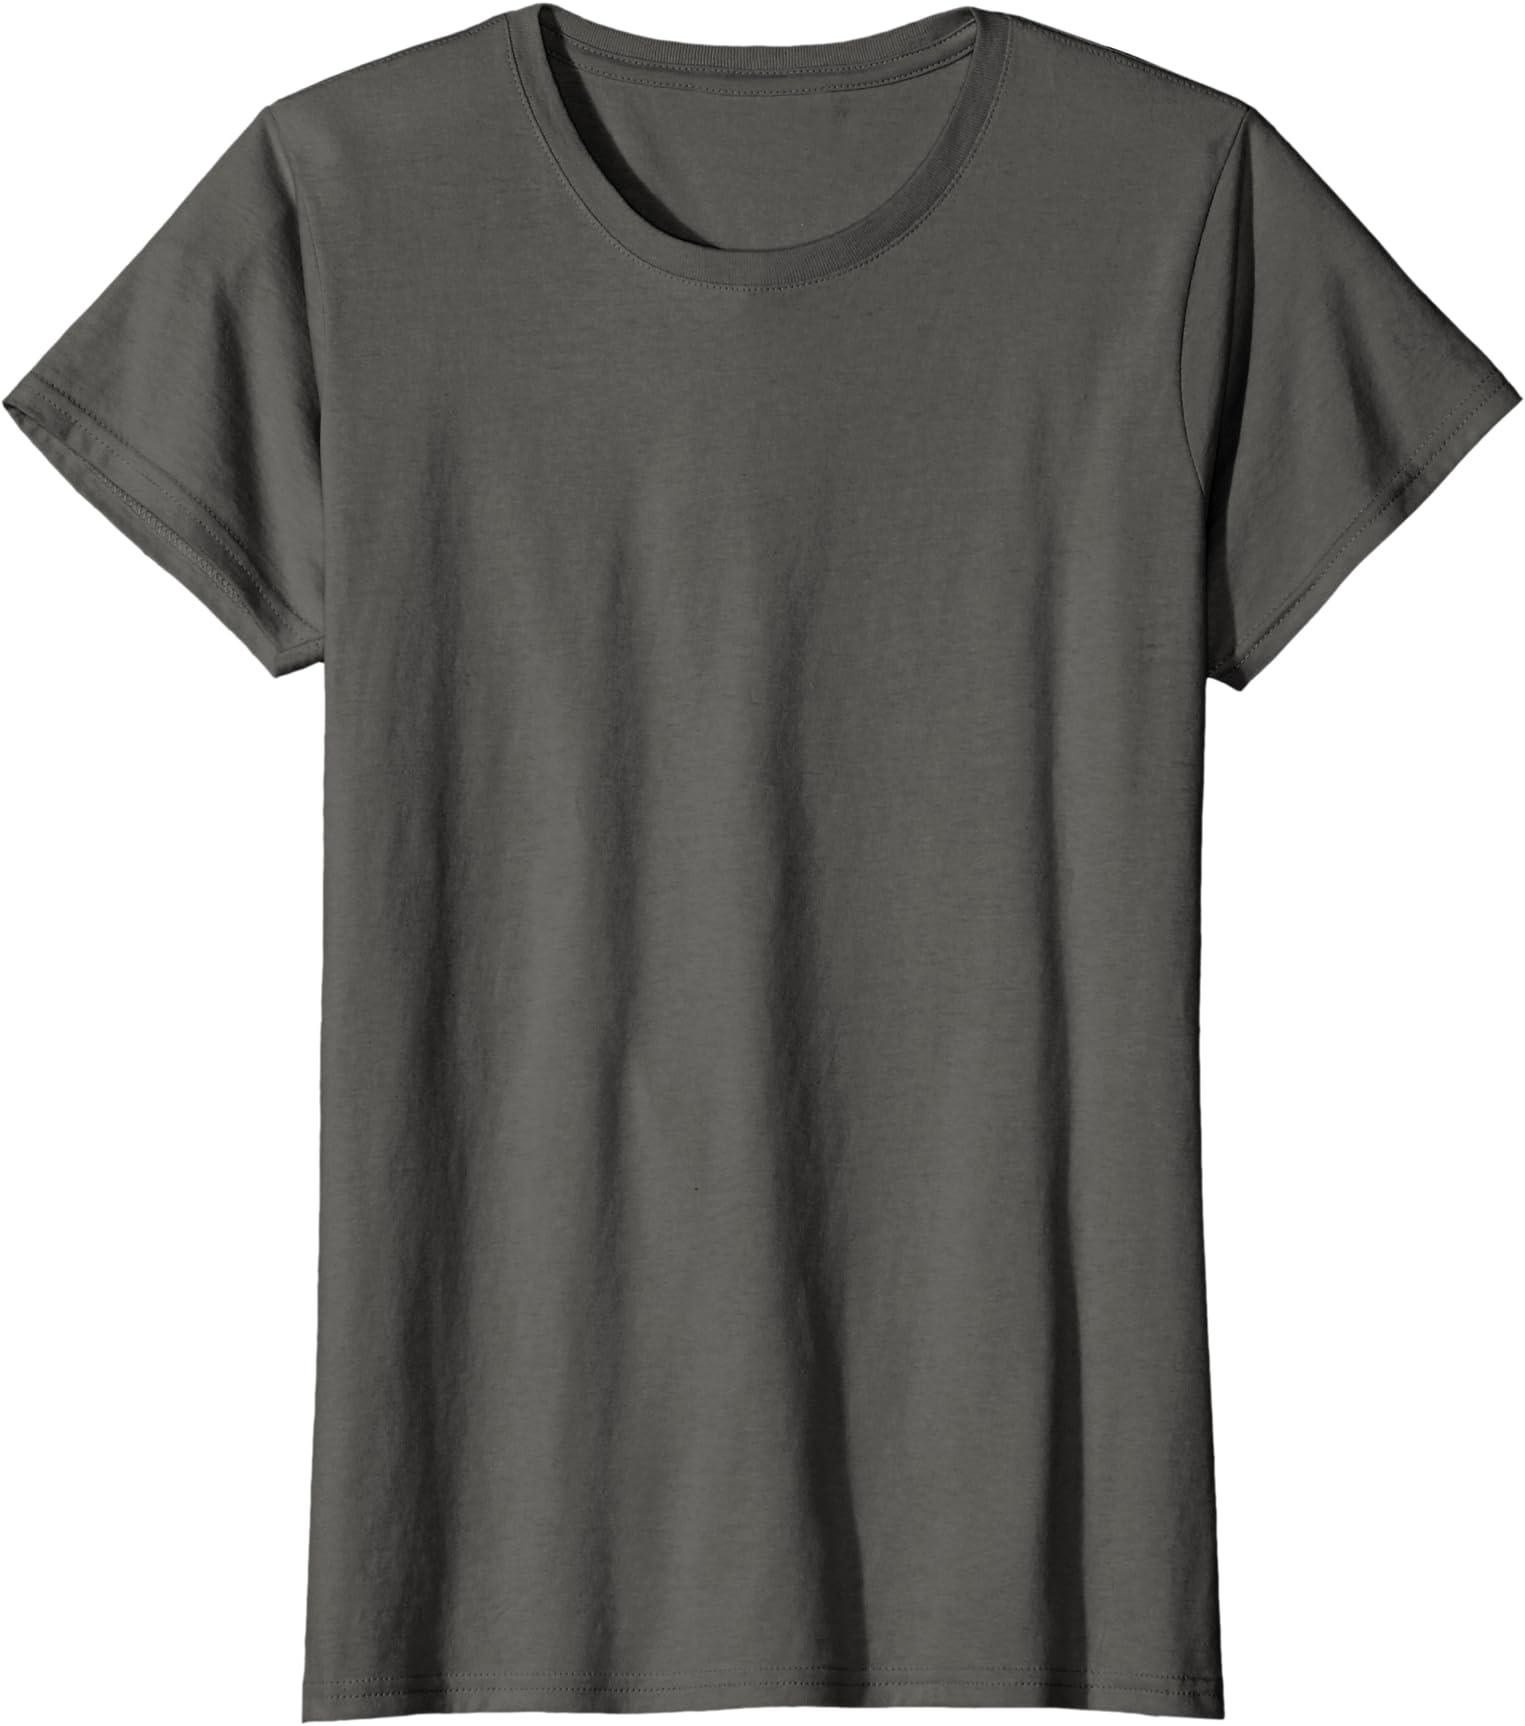 WWBD LOGO Heather T-Shirt All Sizes Batman Dark Knight What Would Batman Do